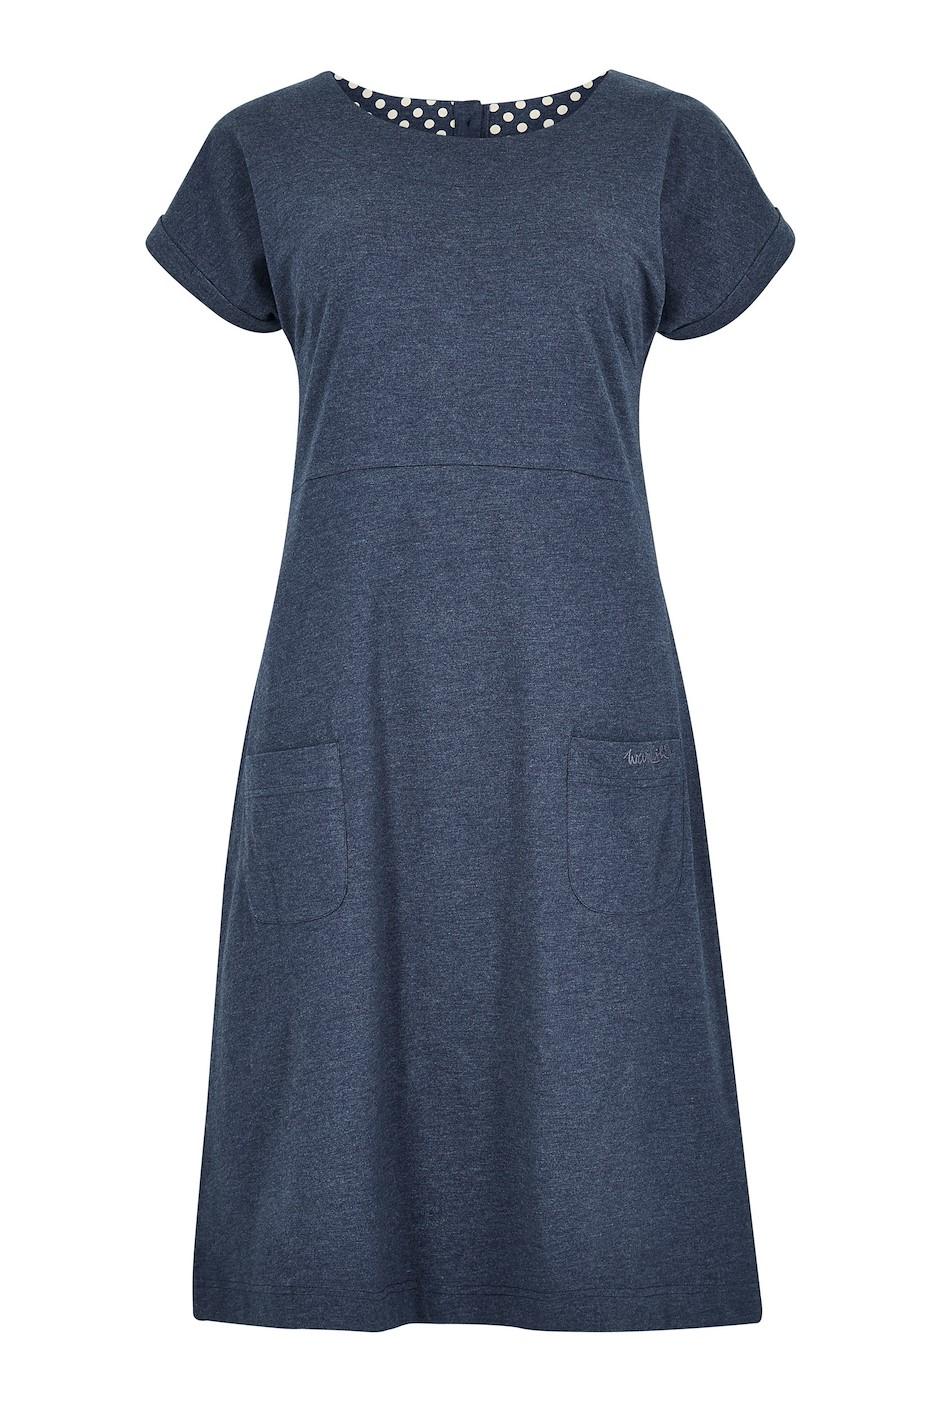 Talia Plain Jersey Dress Dark Navy